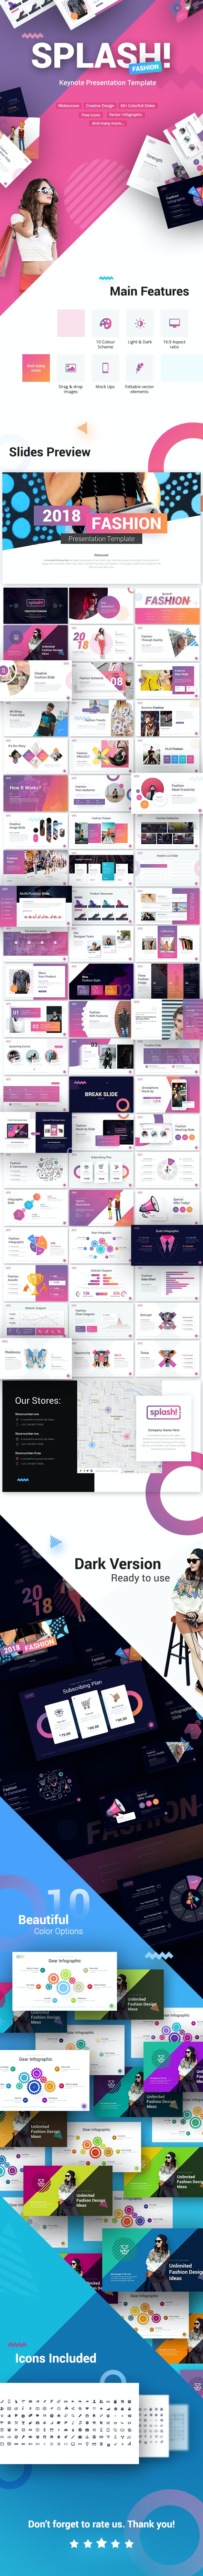 Splash Fashion Keynote Presentation Template - Keynote Templates Presentation Templates